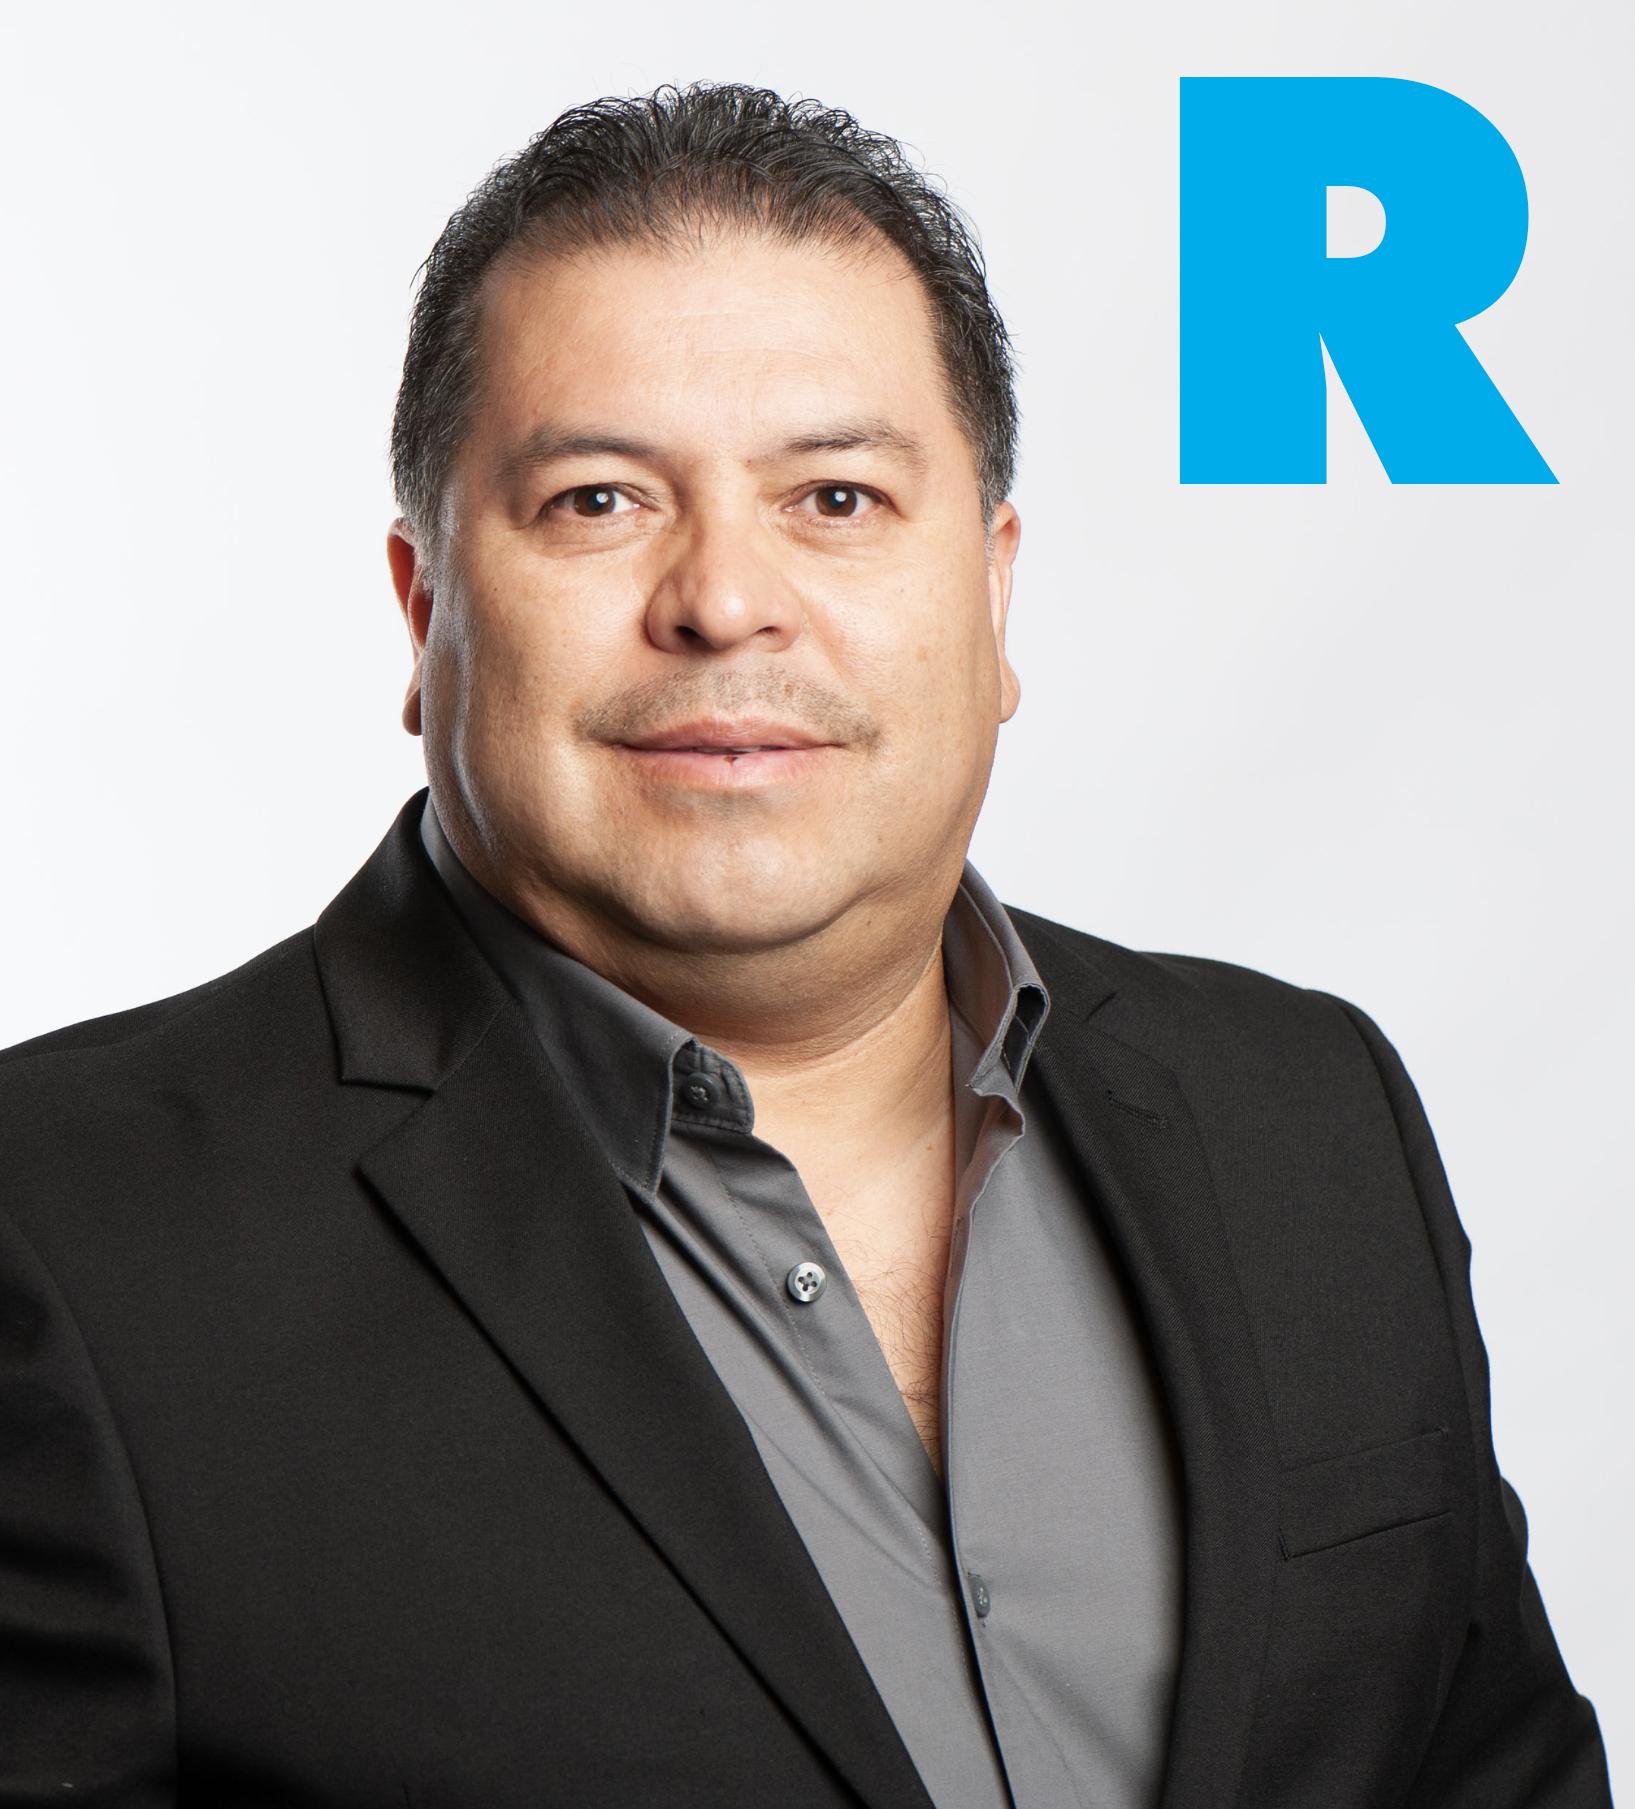 Matthew Rodriquez - Account Manager